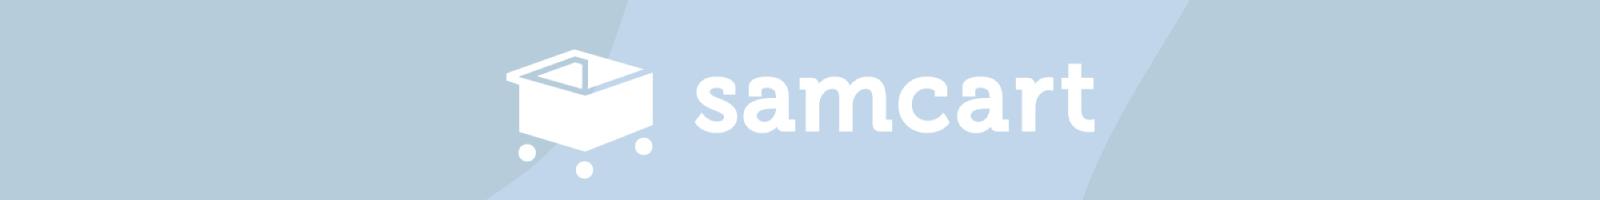 Samcart logo